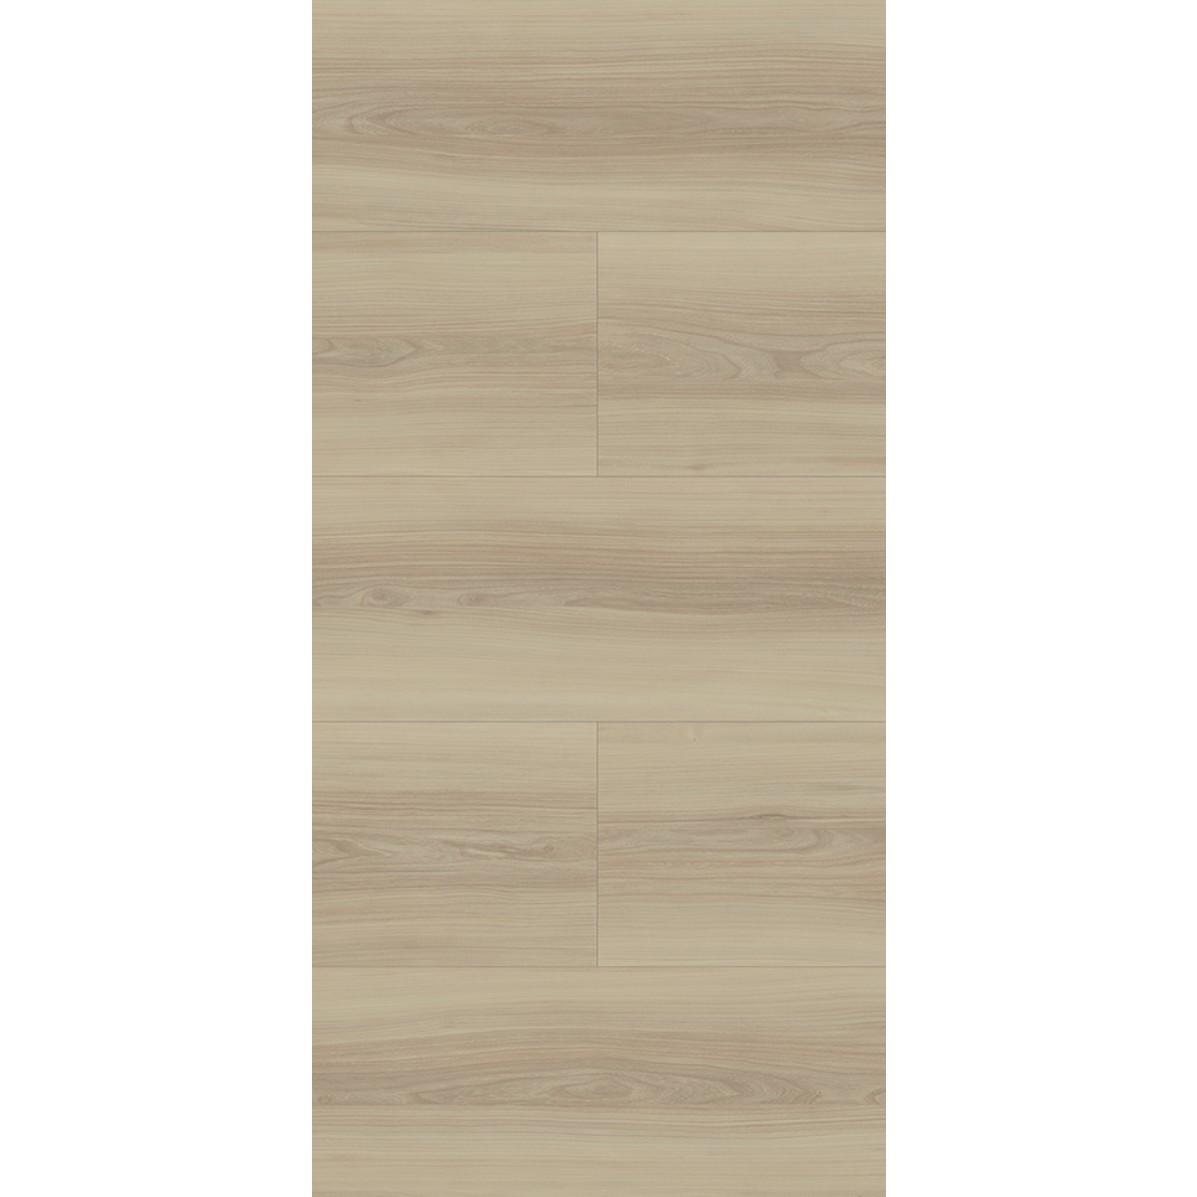 Piso Laminado 27 x 137 cm Link Mancora 2991 m - Durafloor